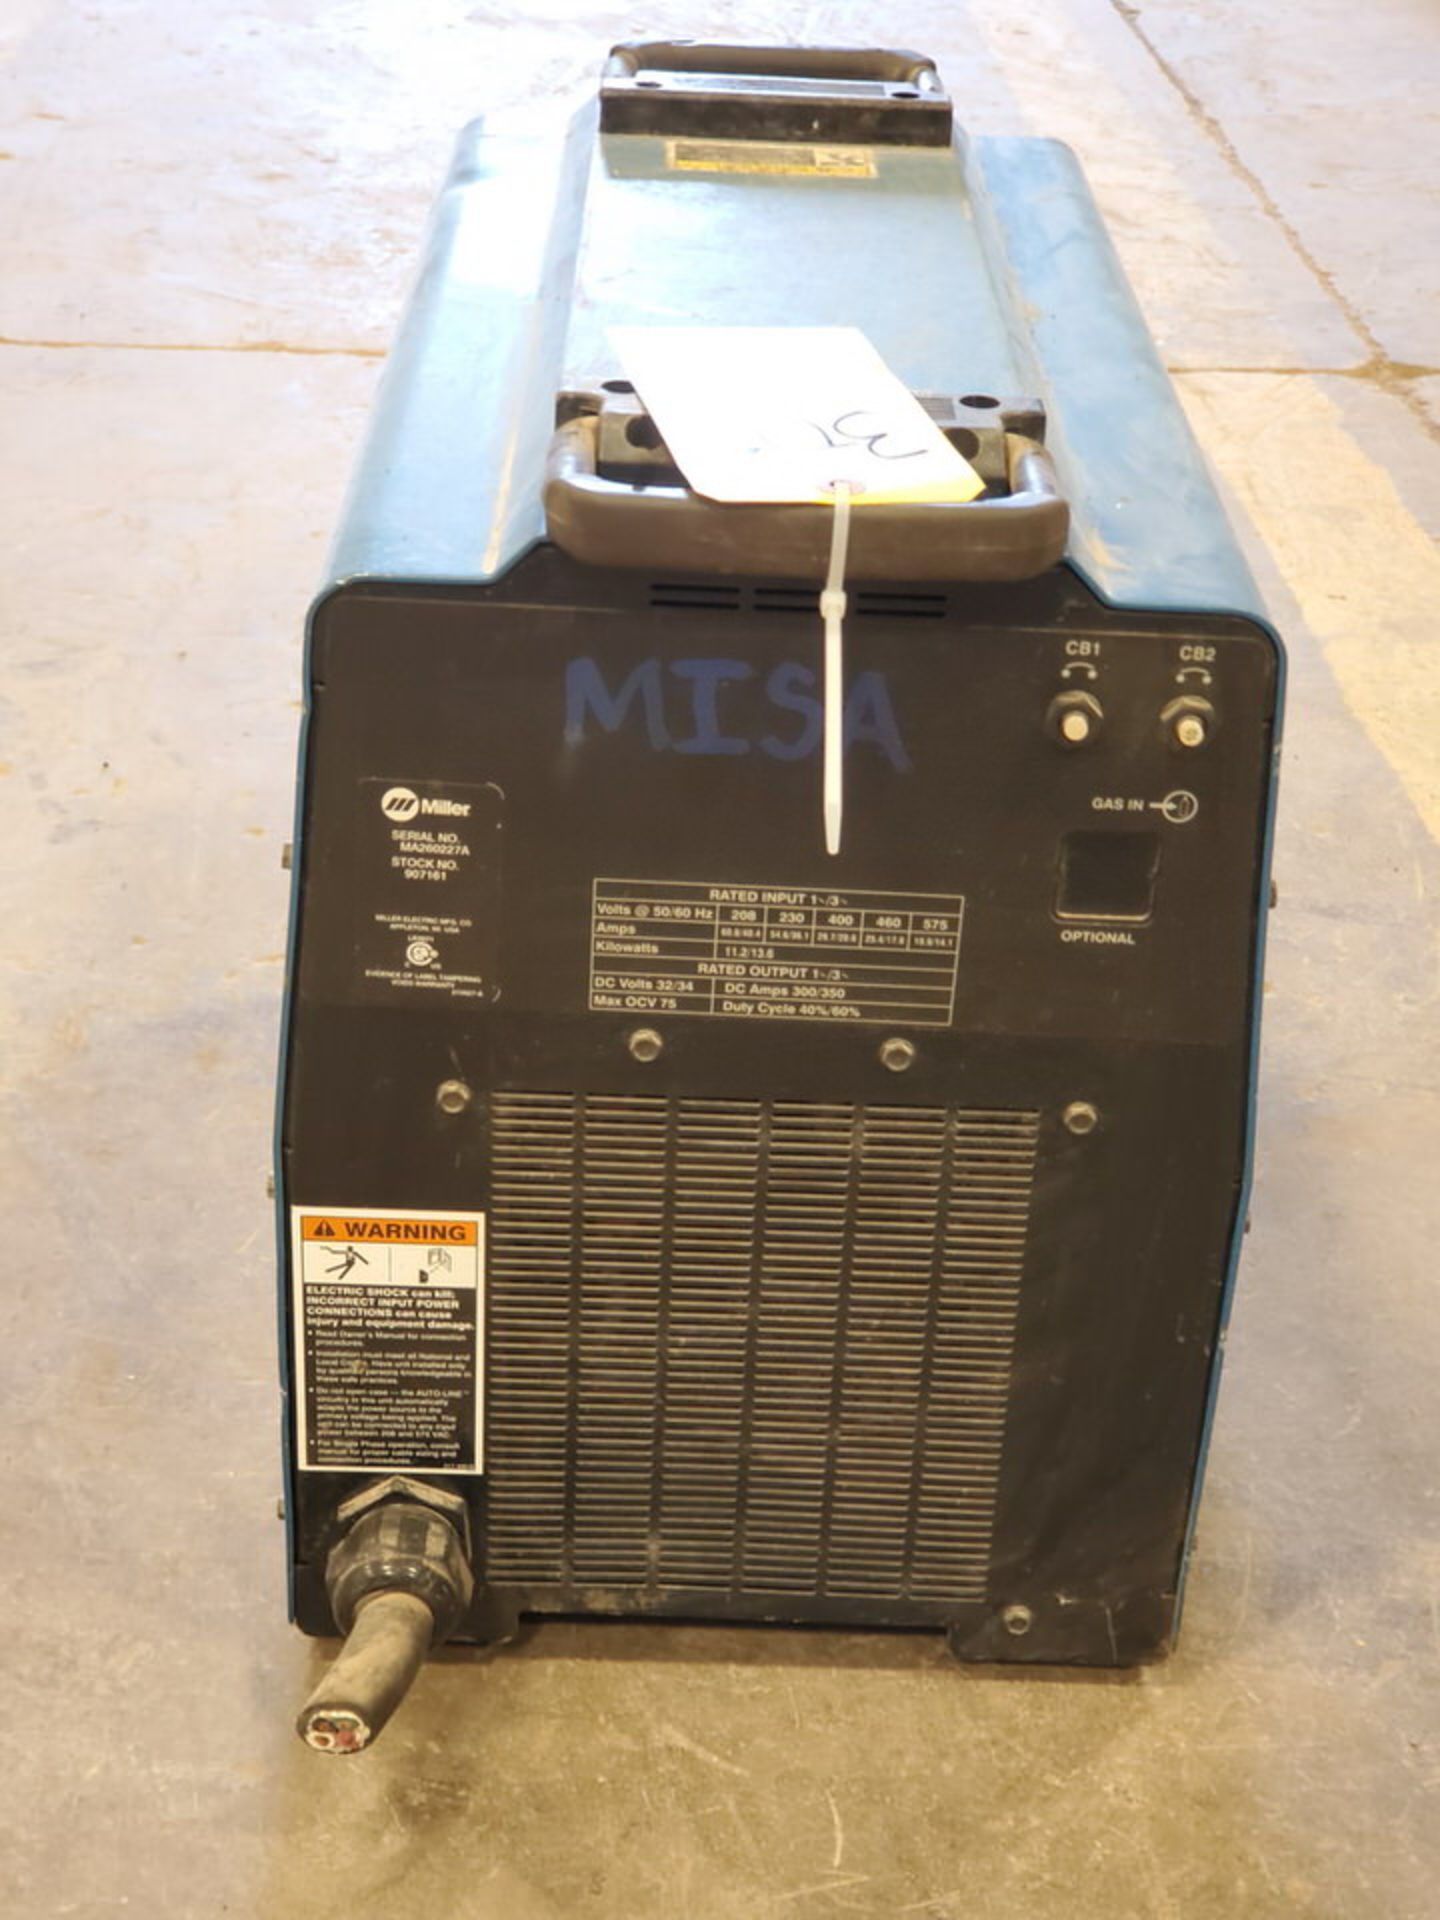 Miller Plasma Cutter 208-575V, 1/3PH, 50/60HZ - Image 3 of 5